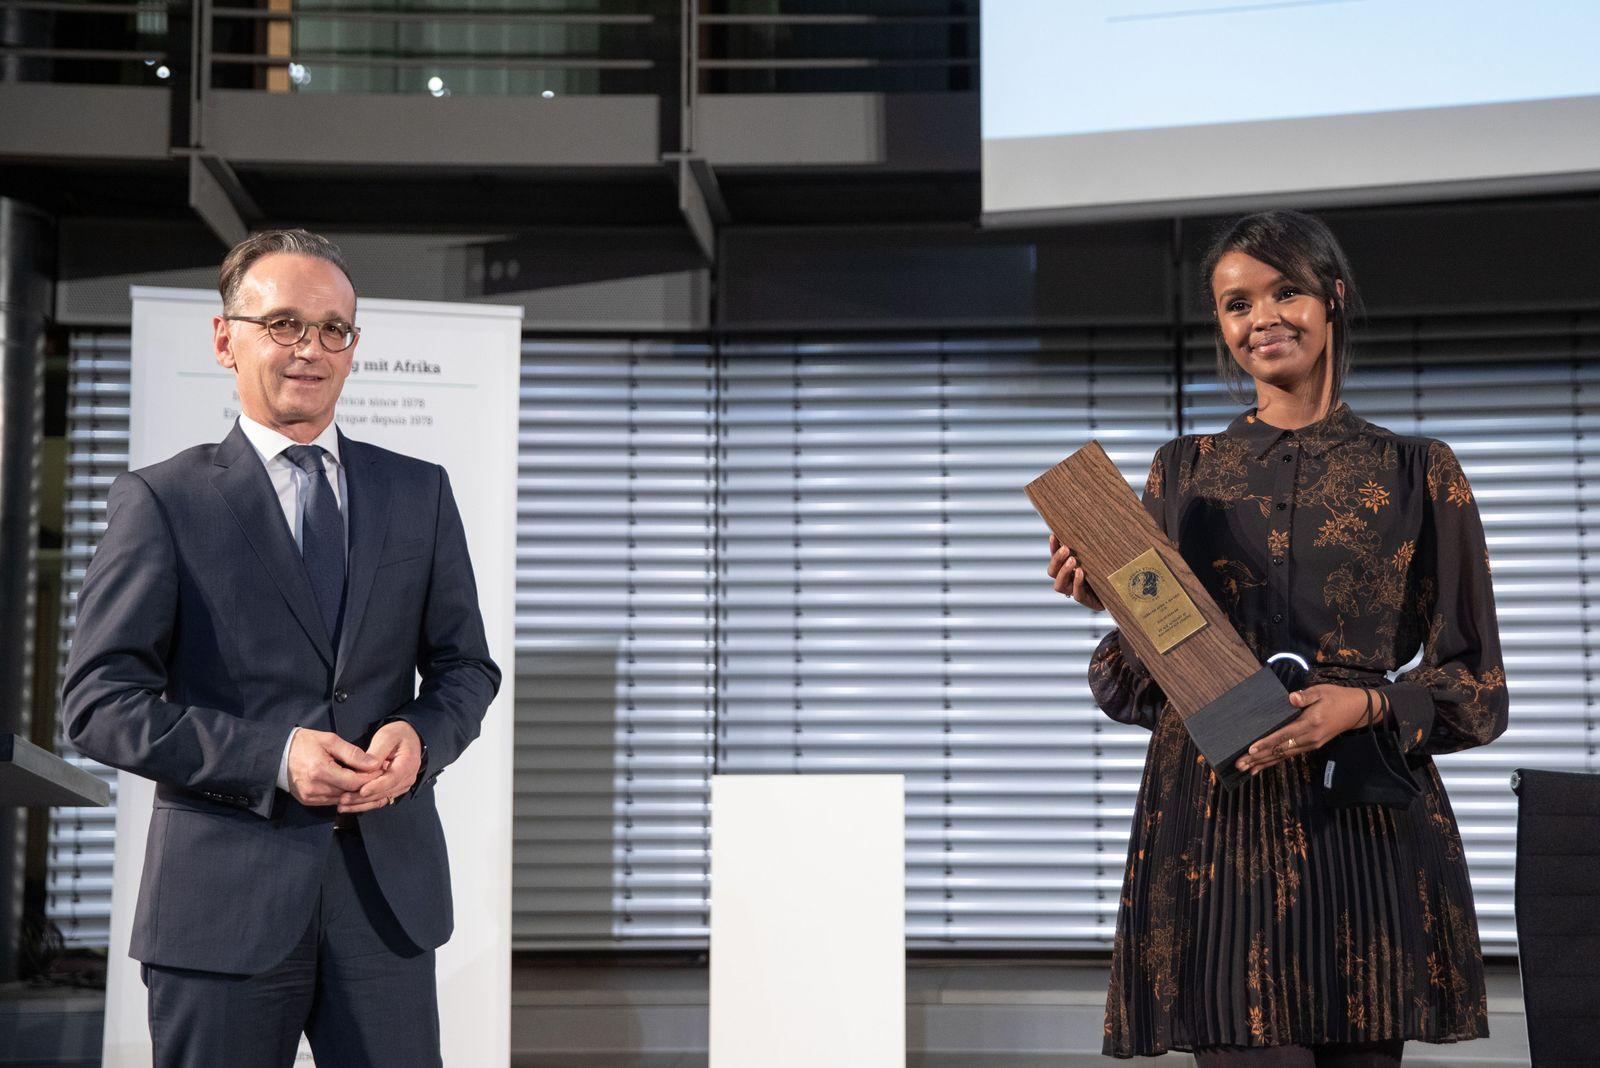 German Africa Prize 2020, Berlin, Germany - 27 Oct 2020